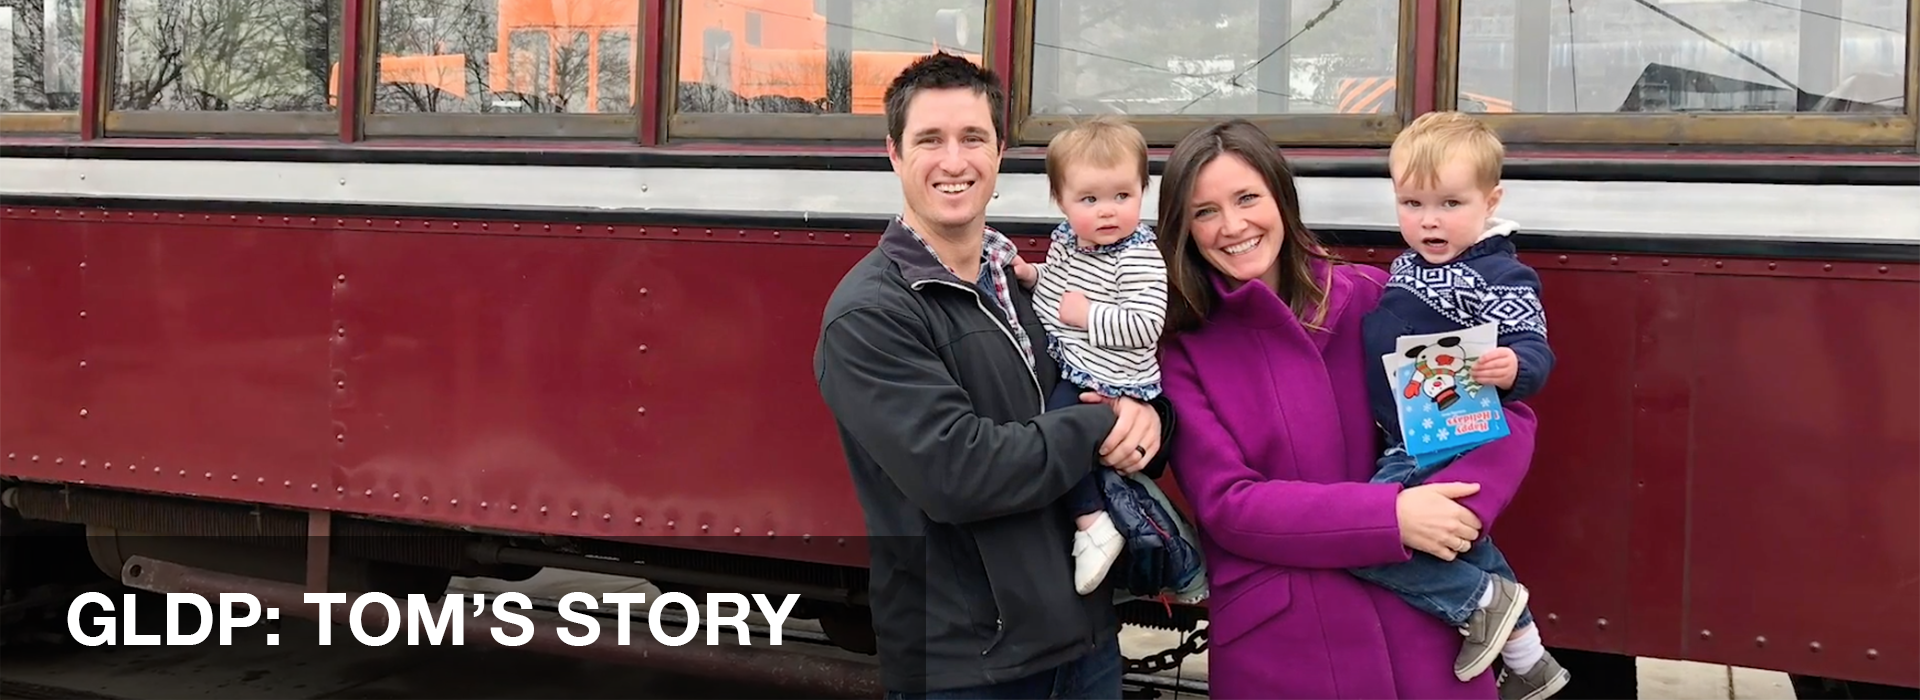 GLDP: TOM'S STORY